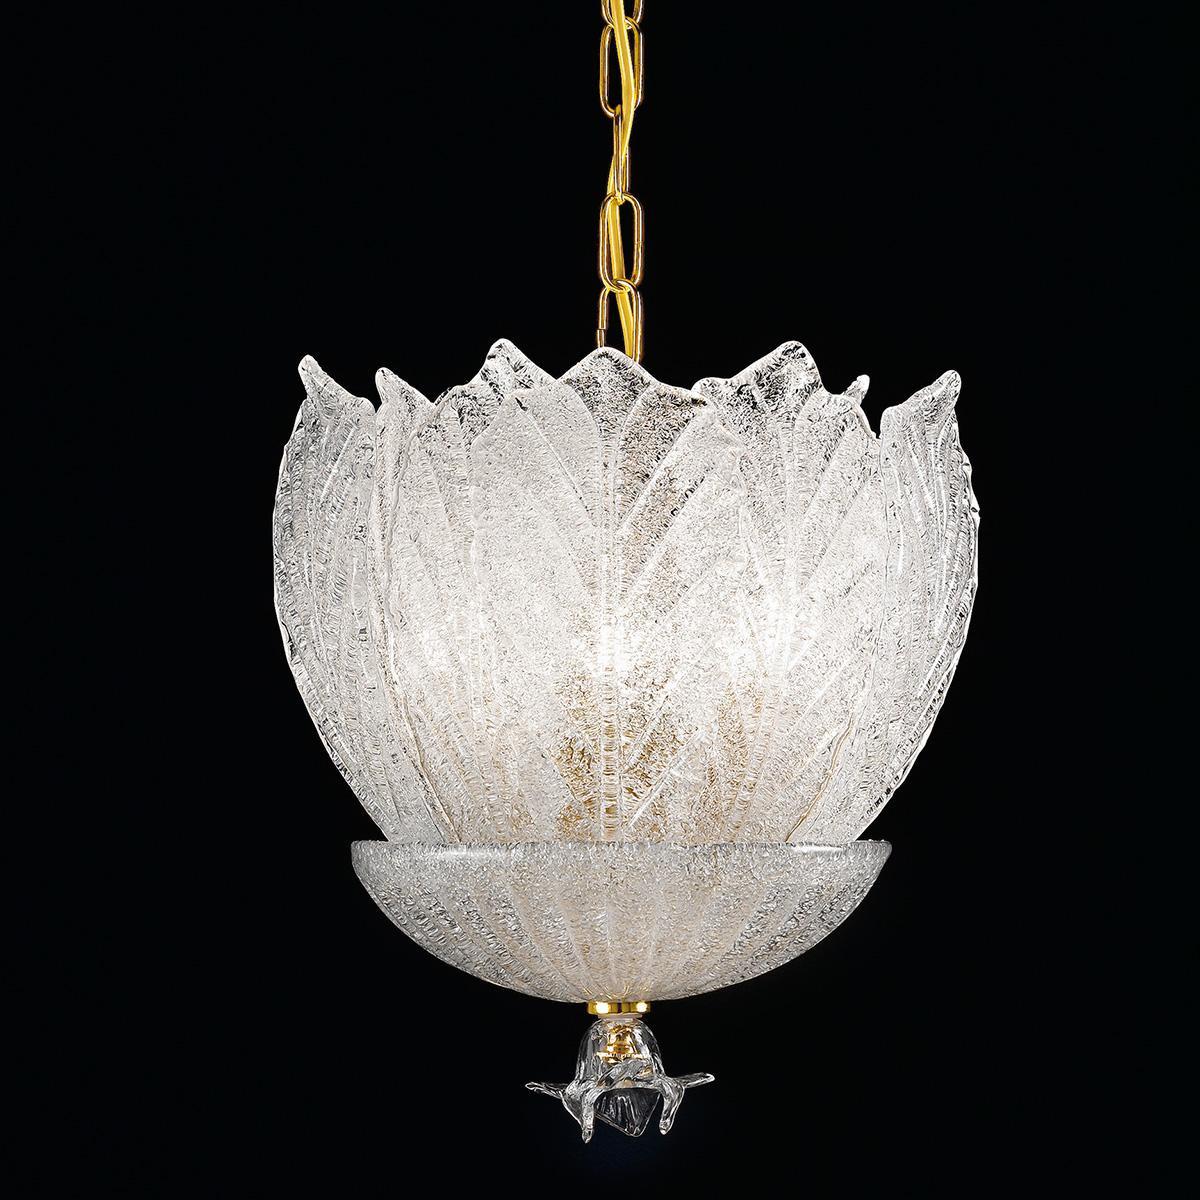 """Luigia"" lámpara colgante en cristal de Murano - 5 luces - ""rugiada"" transparente"